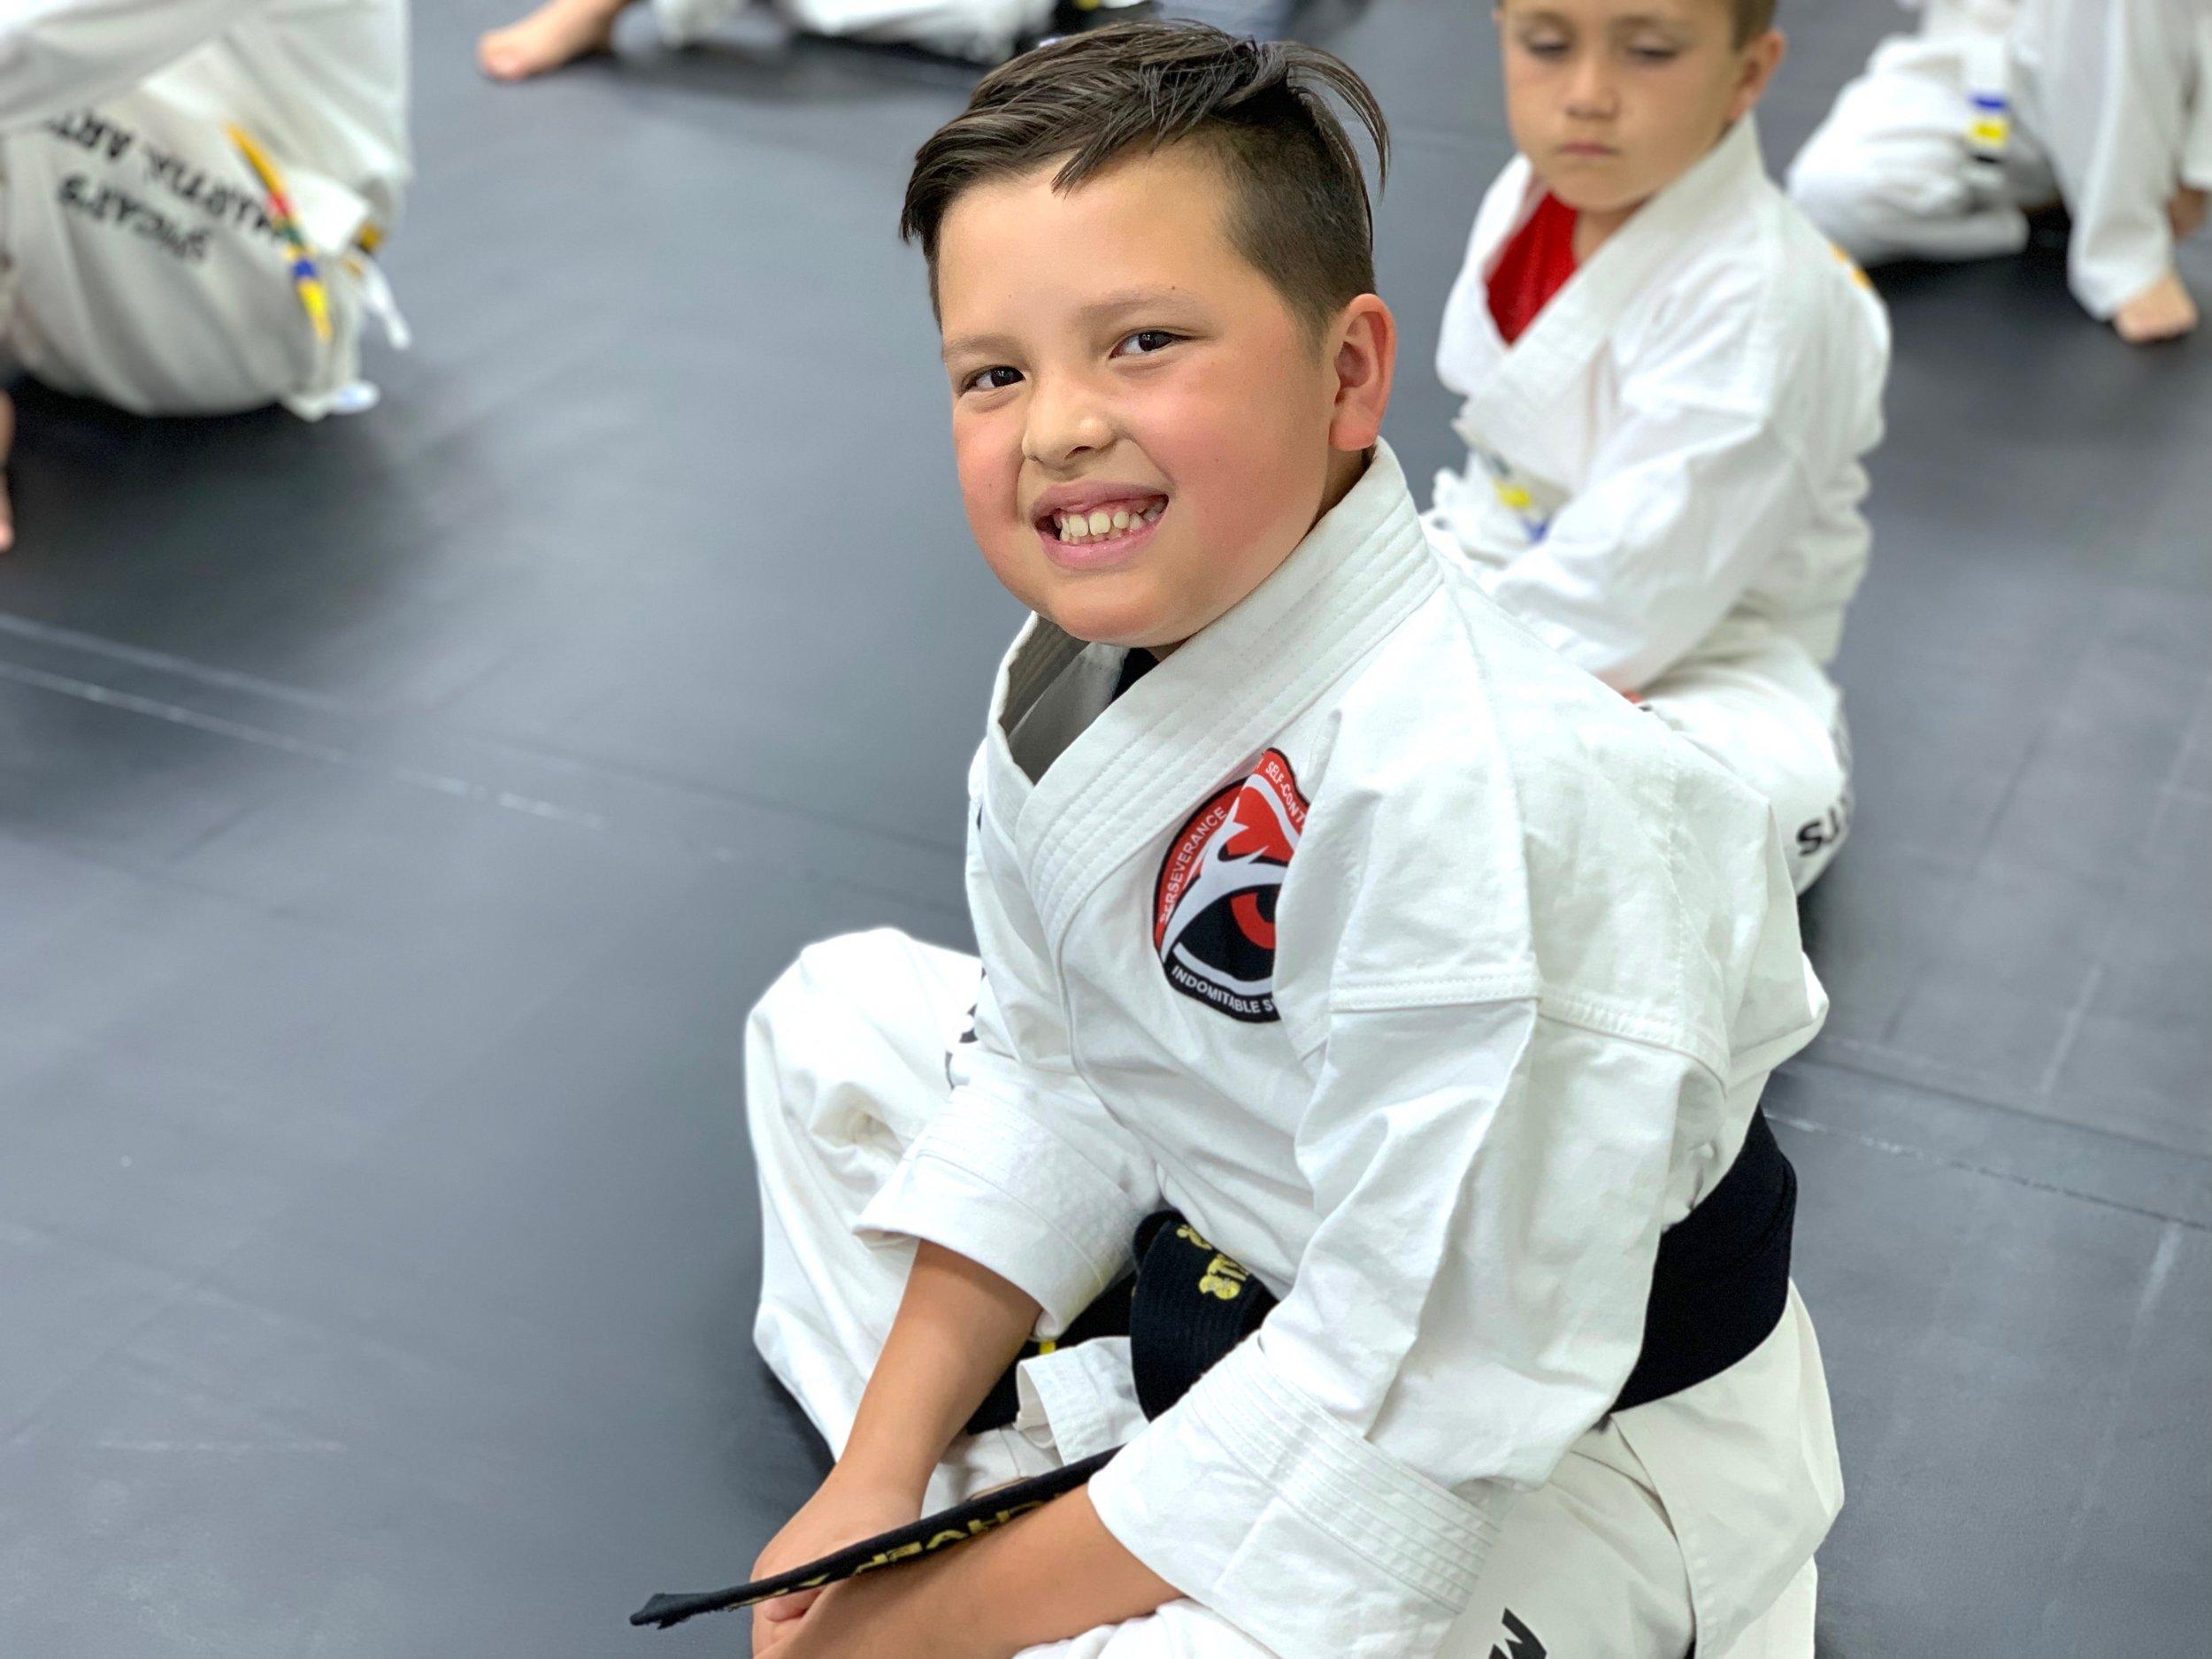 karate-kids-program-souhtlake-keller-grapevine-texas00039.jpeg